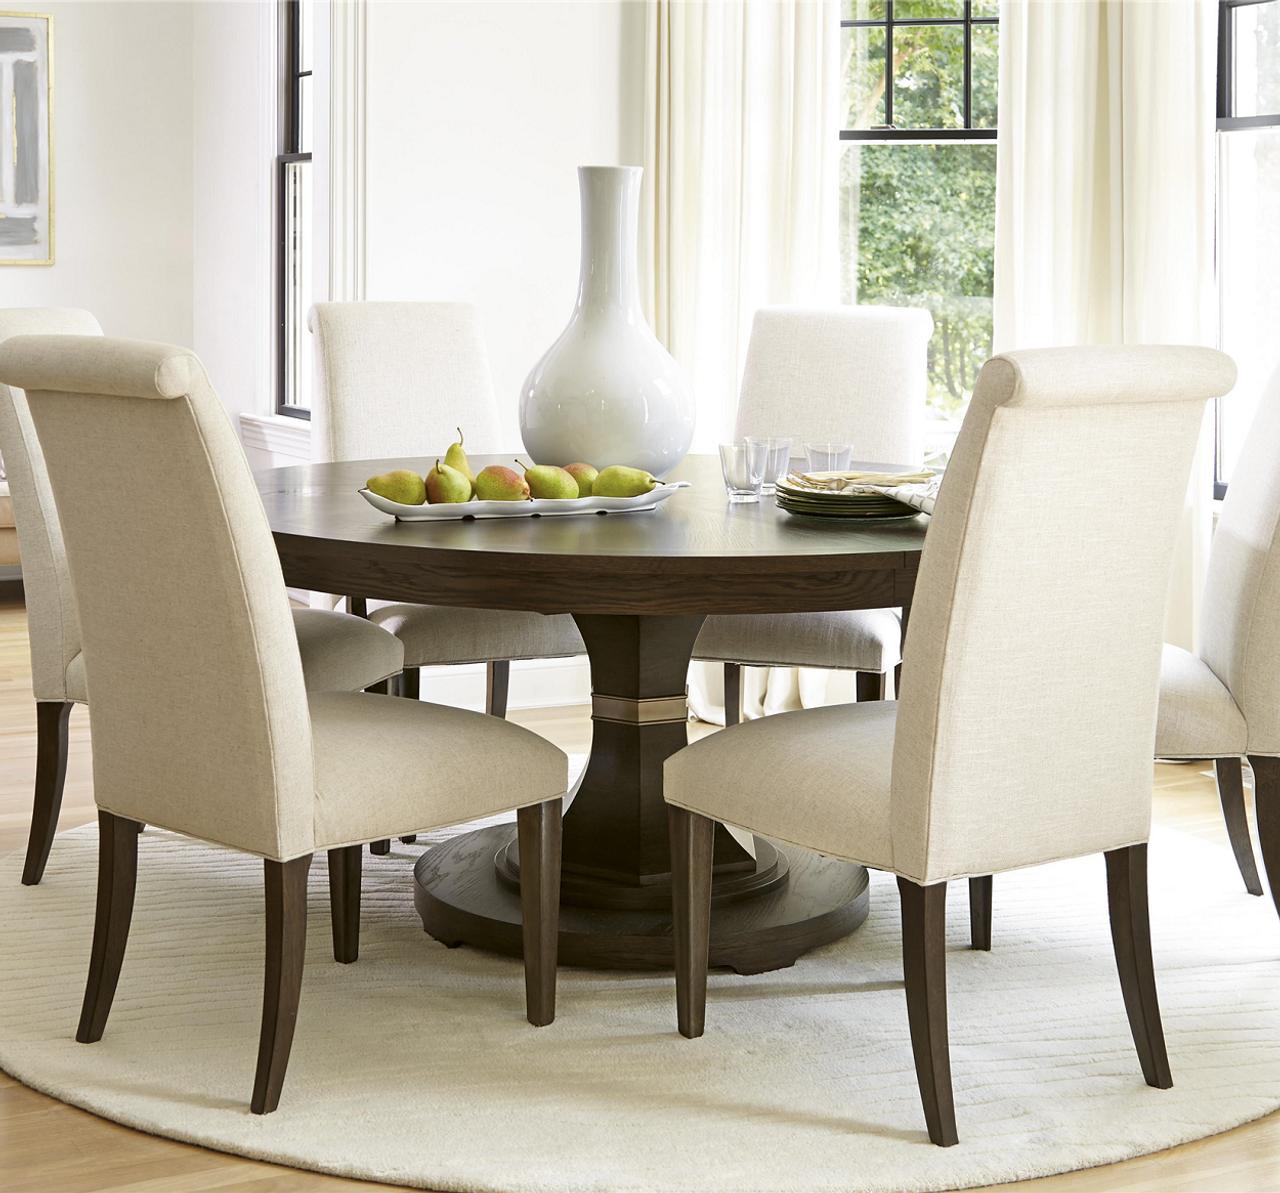 California Rustic Oak 7 Piece Round Dining Room Set Zin Home